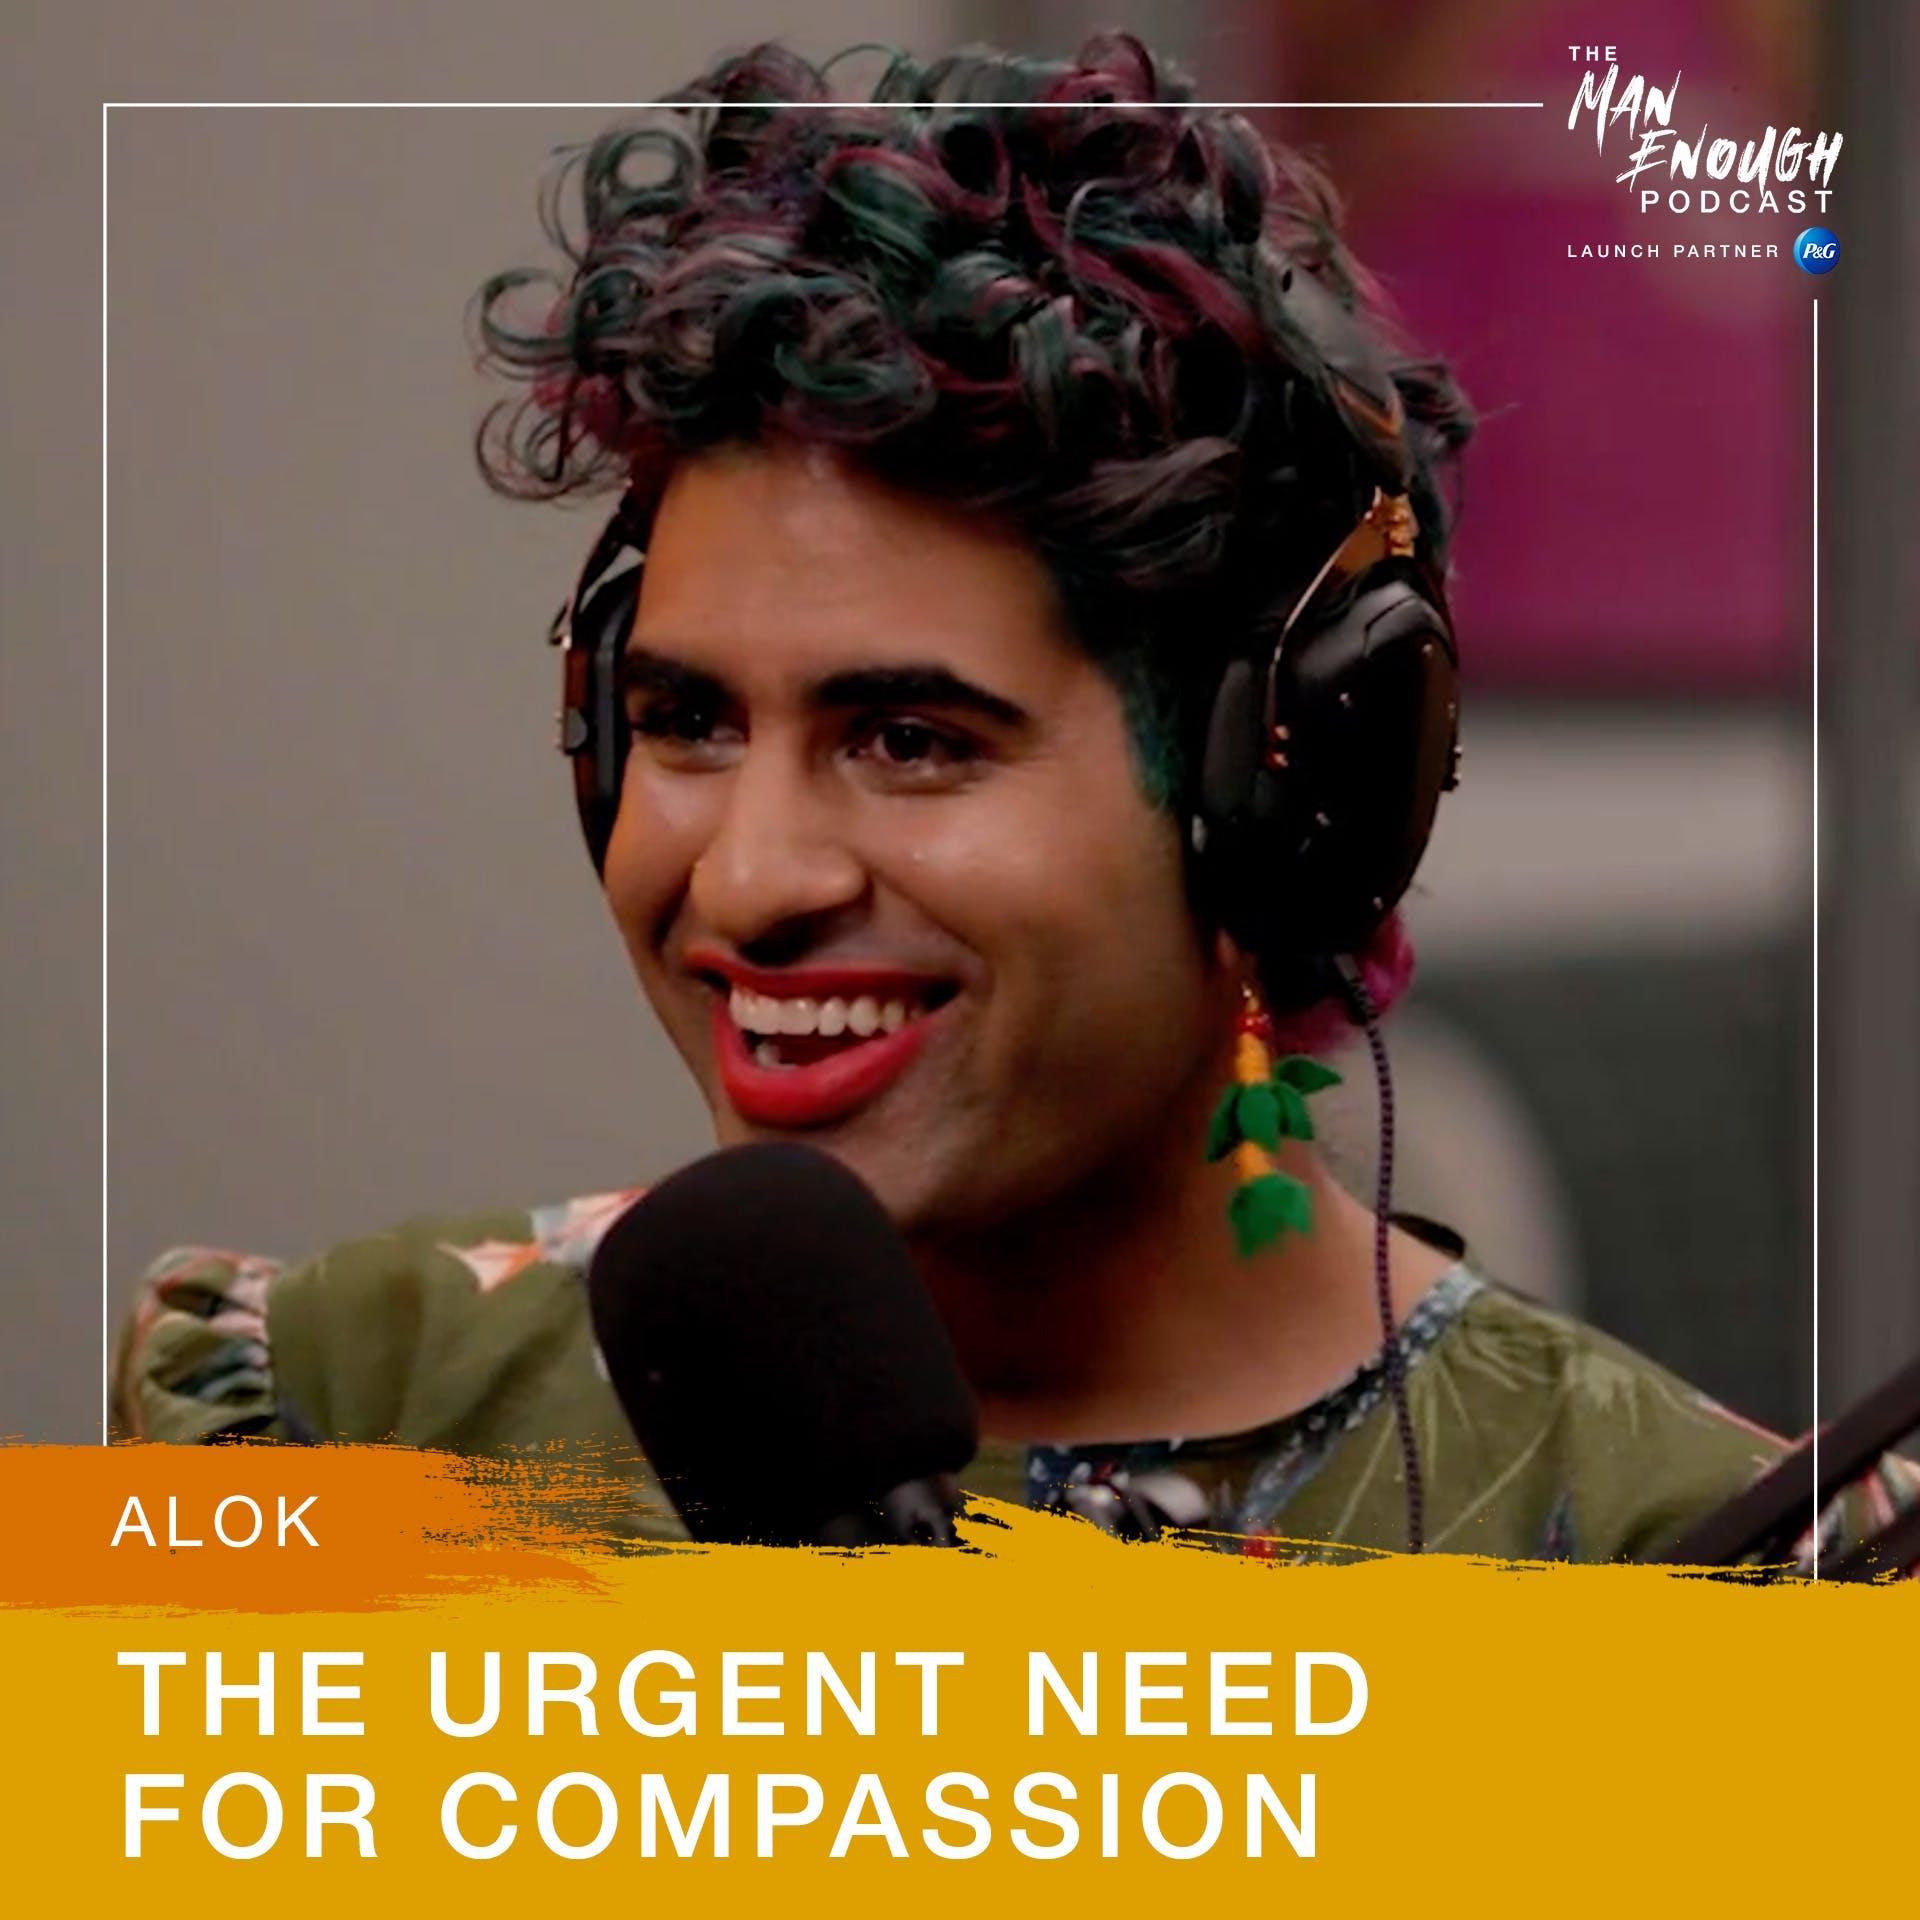 Alok Vaid-Menon: The Urgent Need for Compassion